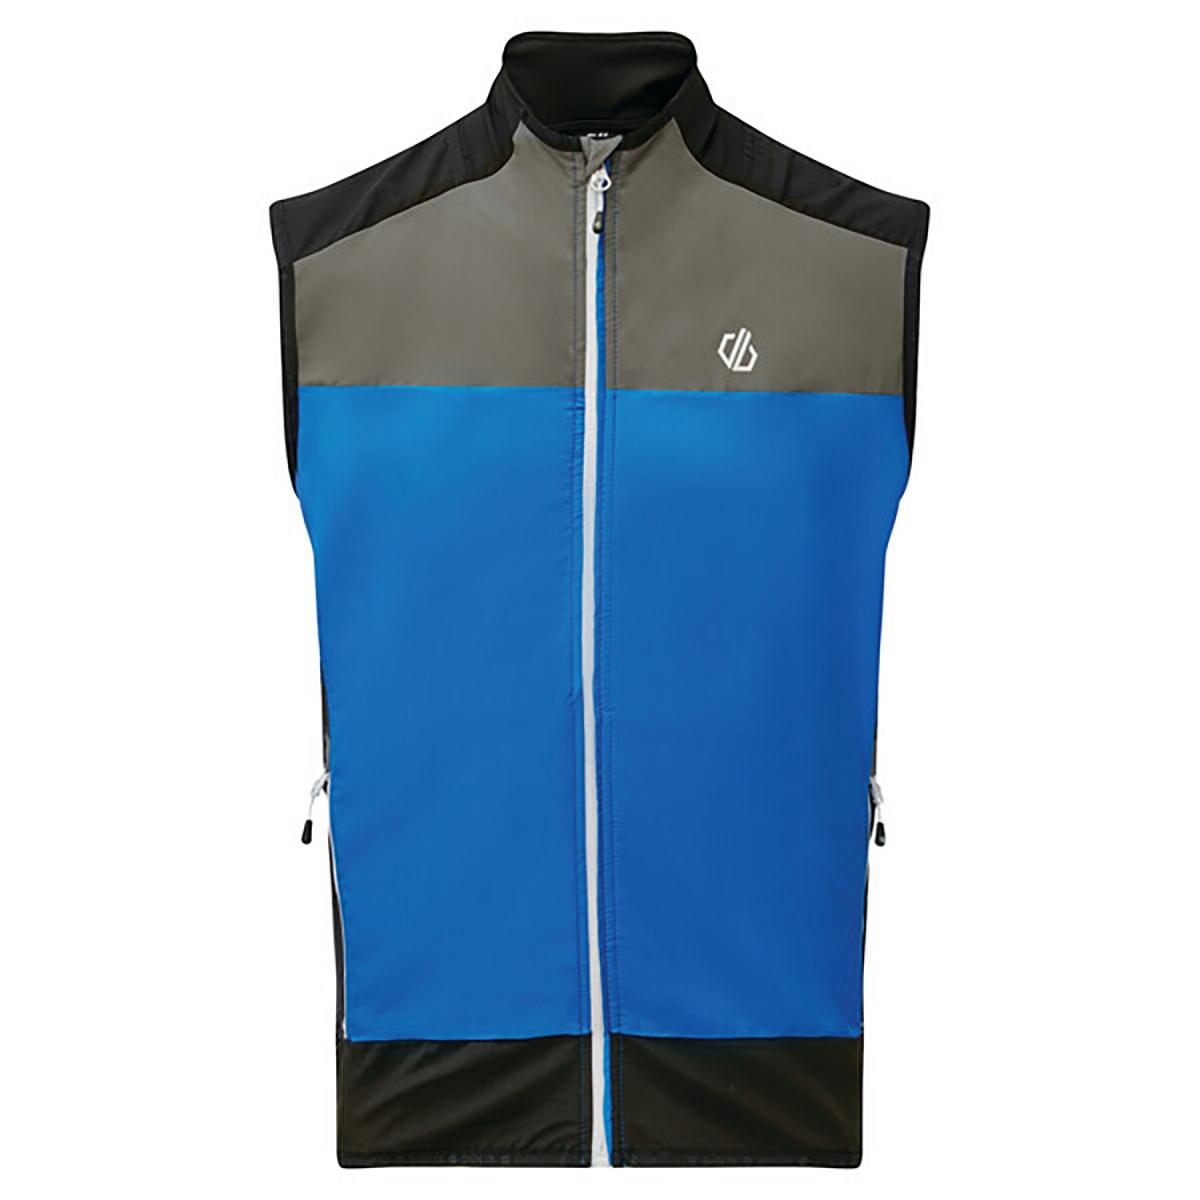 Aptile Vest blauSport Online Shop Sport Rankl